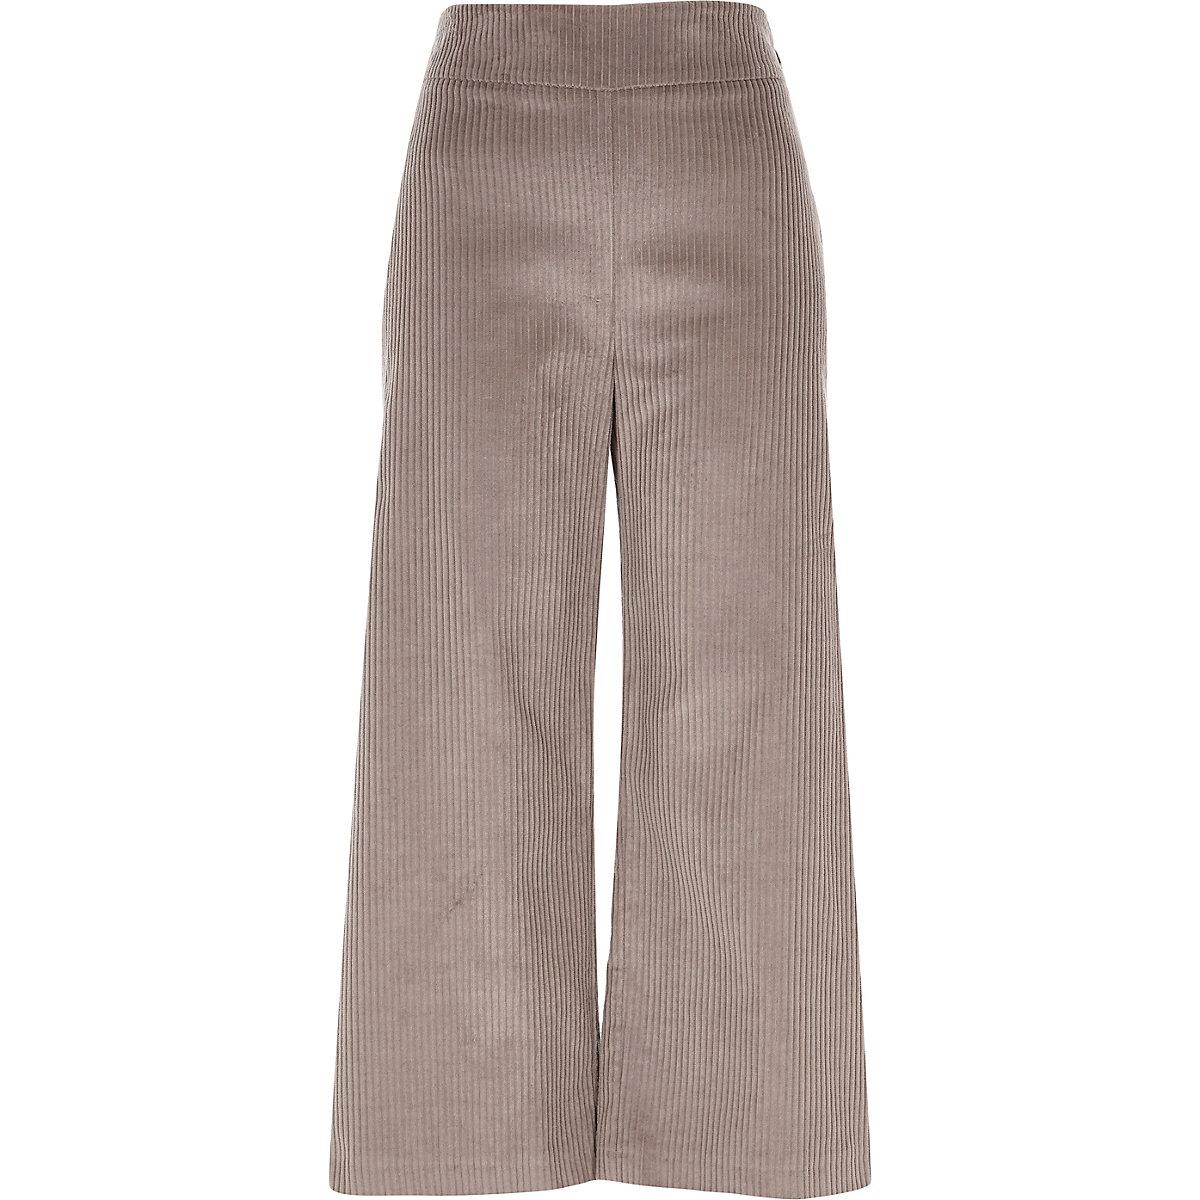 Beige corduroy culottes